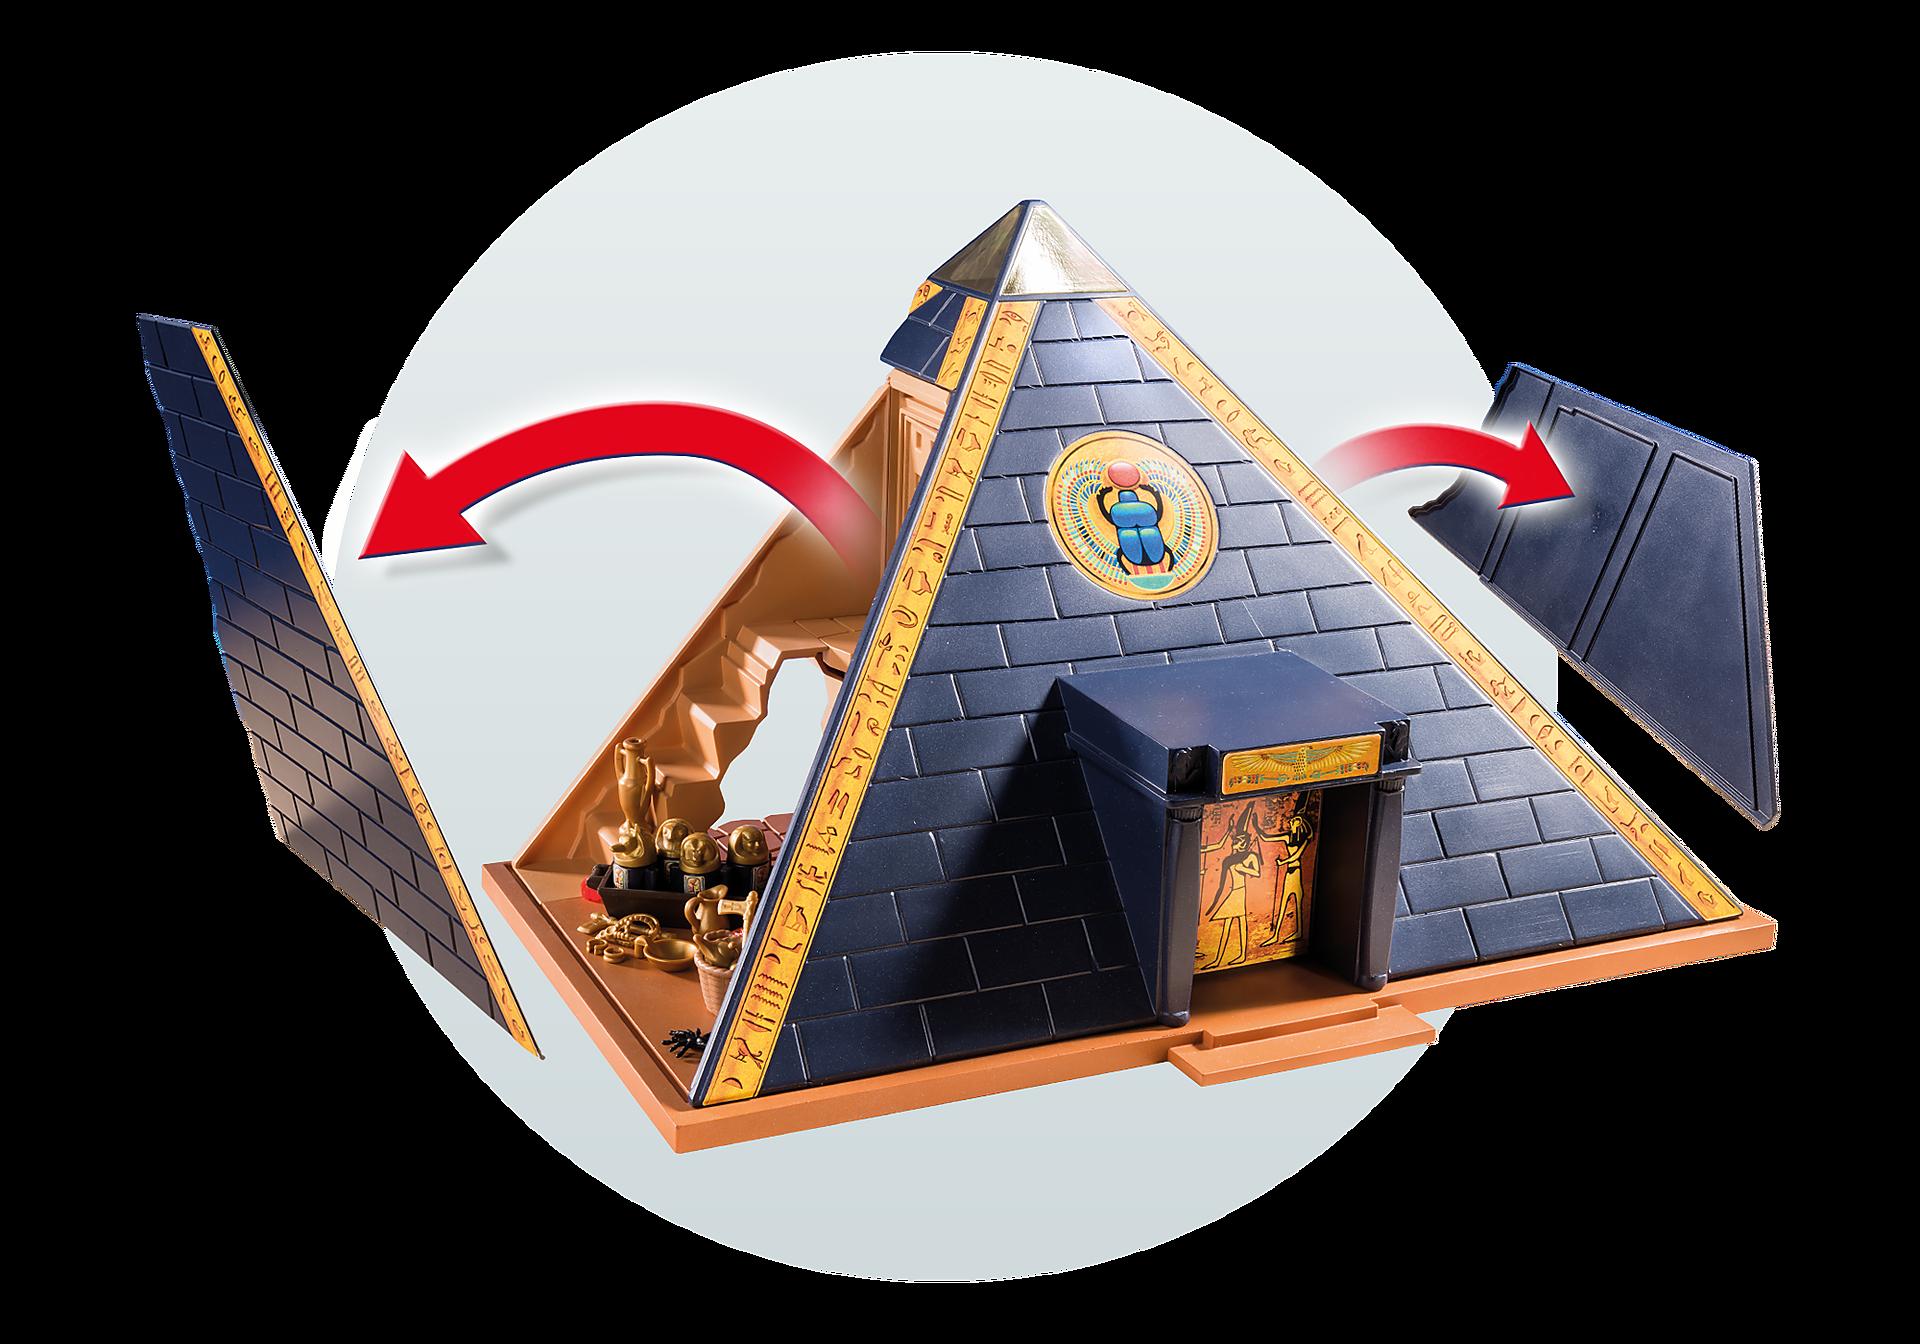 5386 Piramide van de farao zoom image11